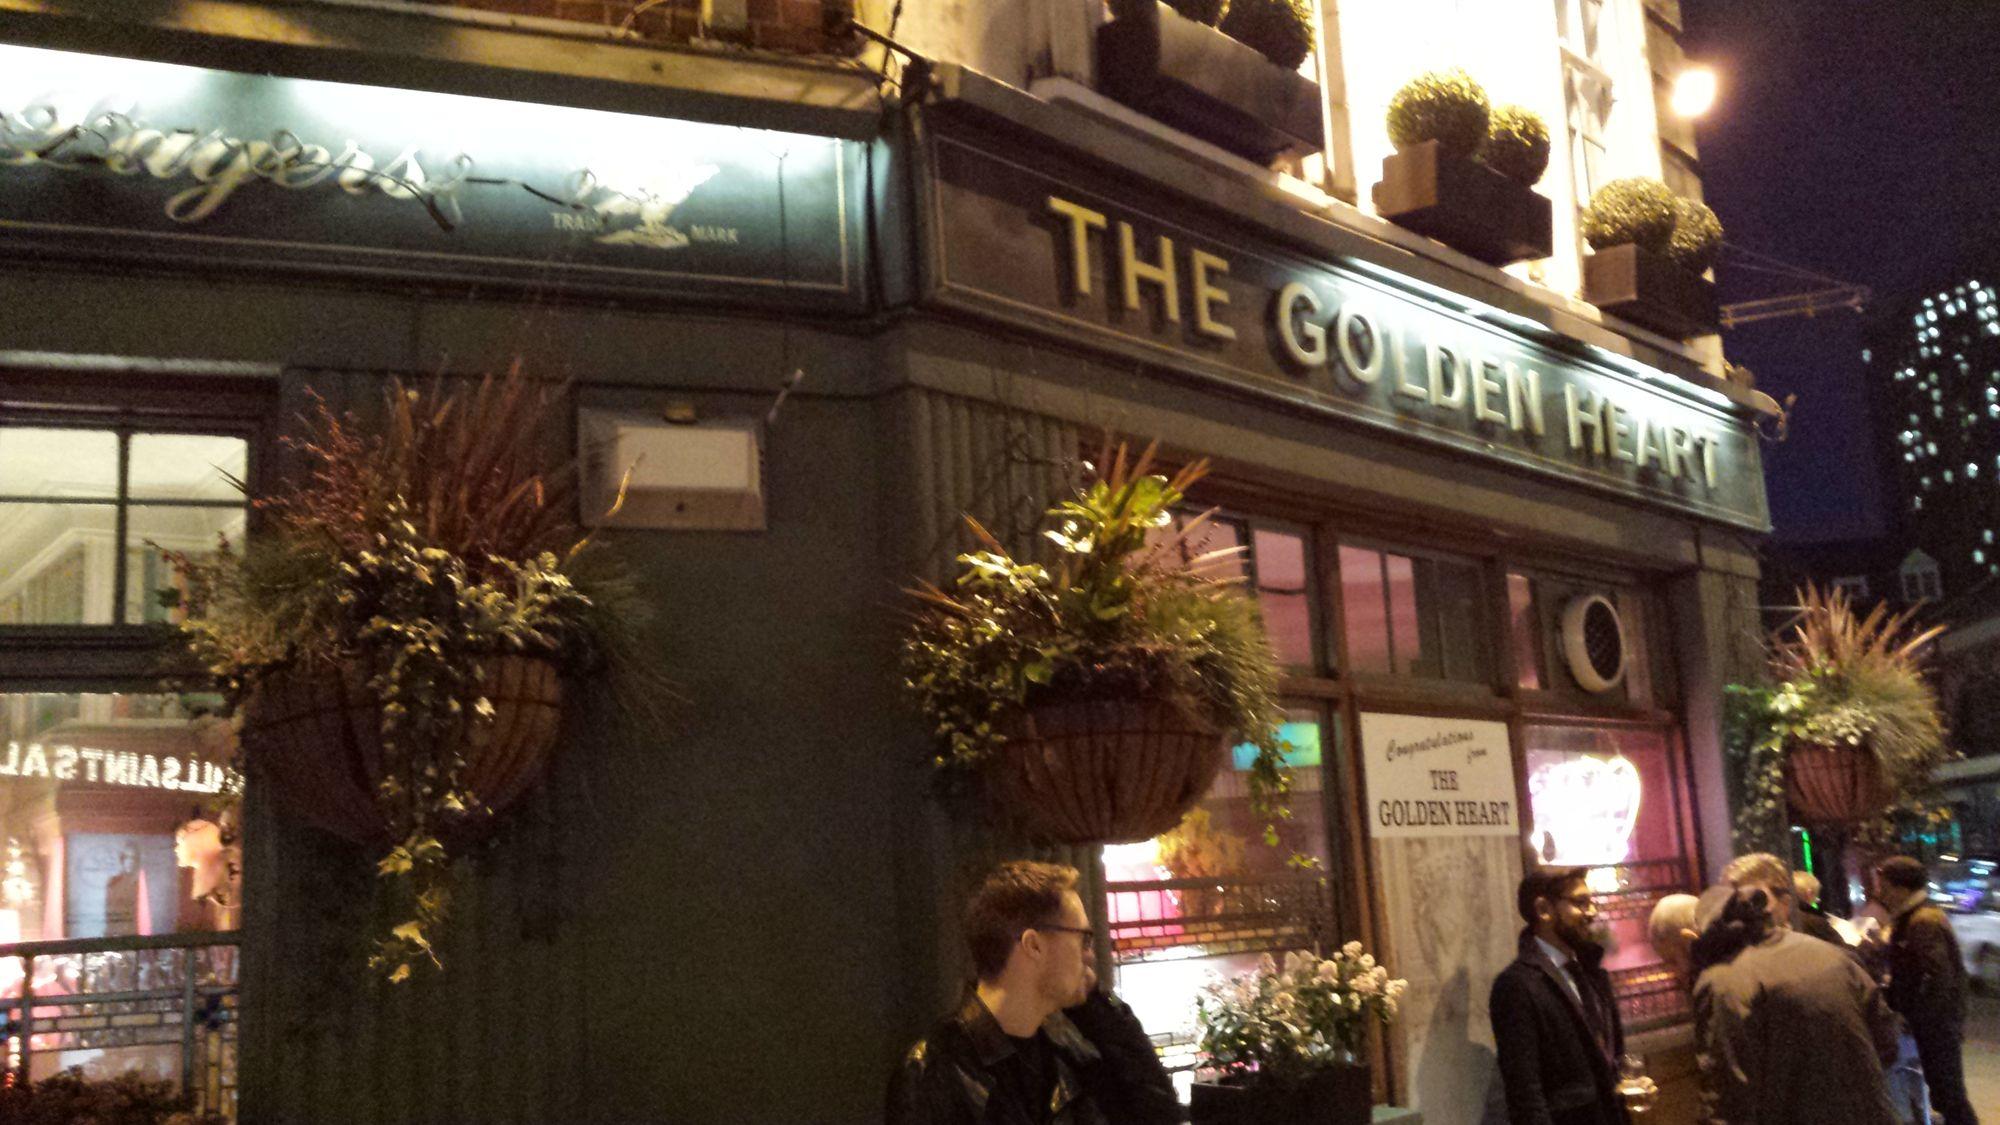 The Golden Heart Pub - Spitalfields